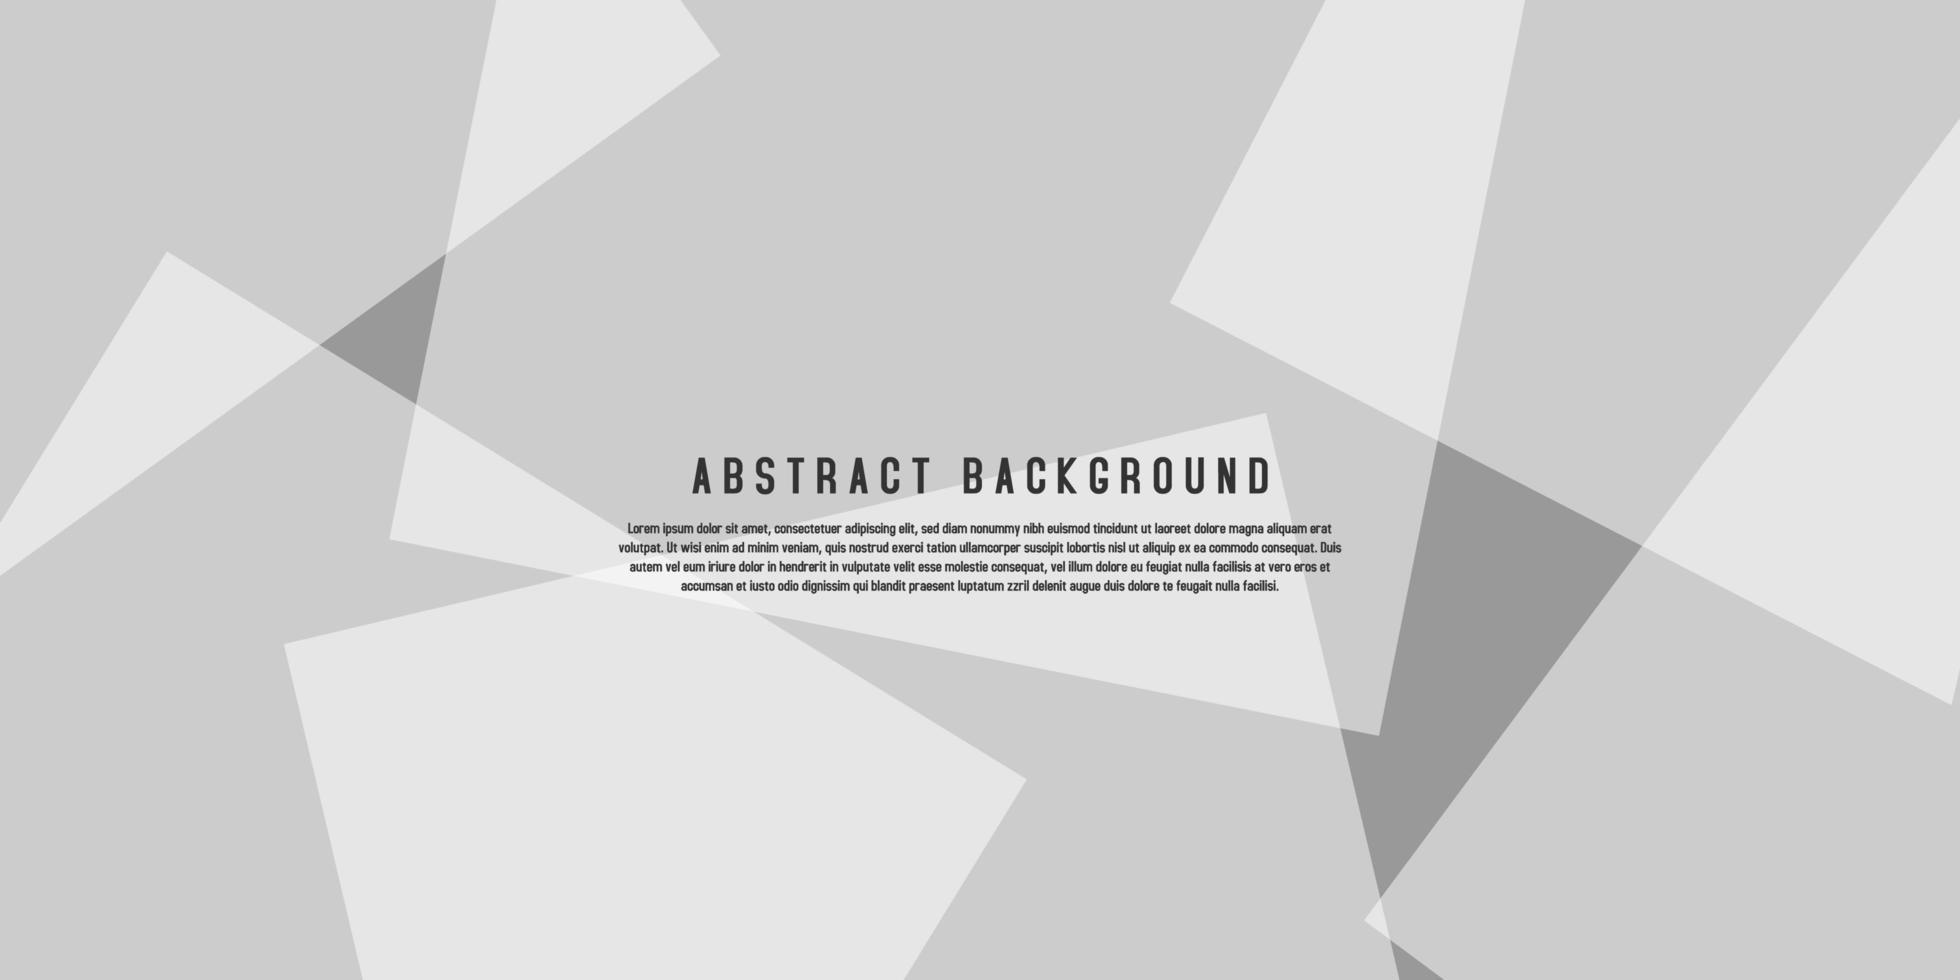 abstrakt papper bakgrund vektor